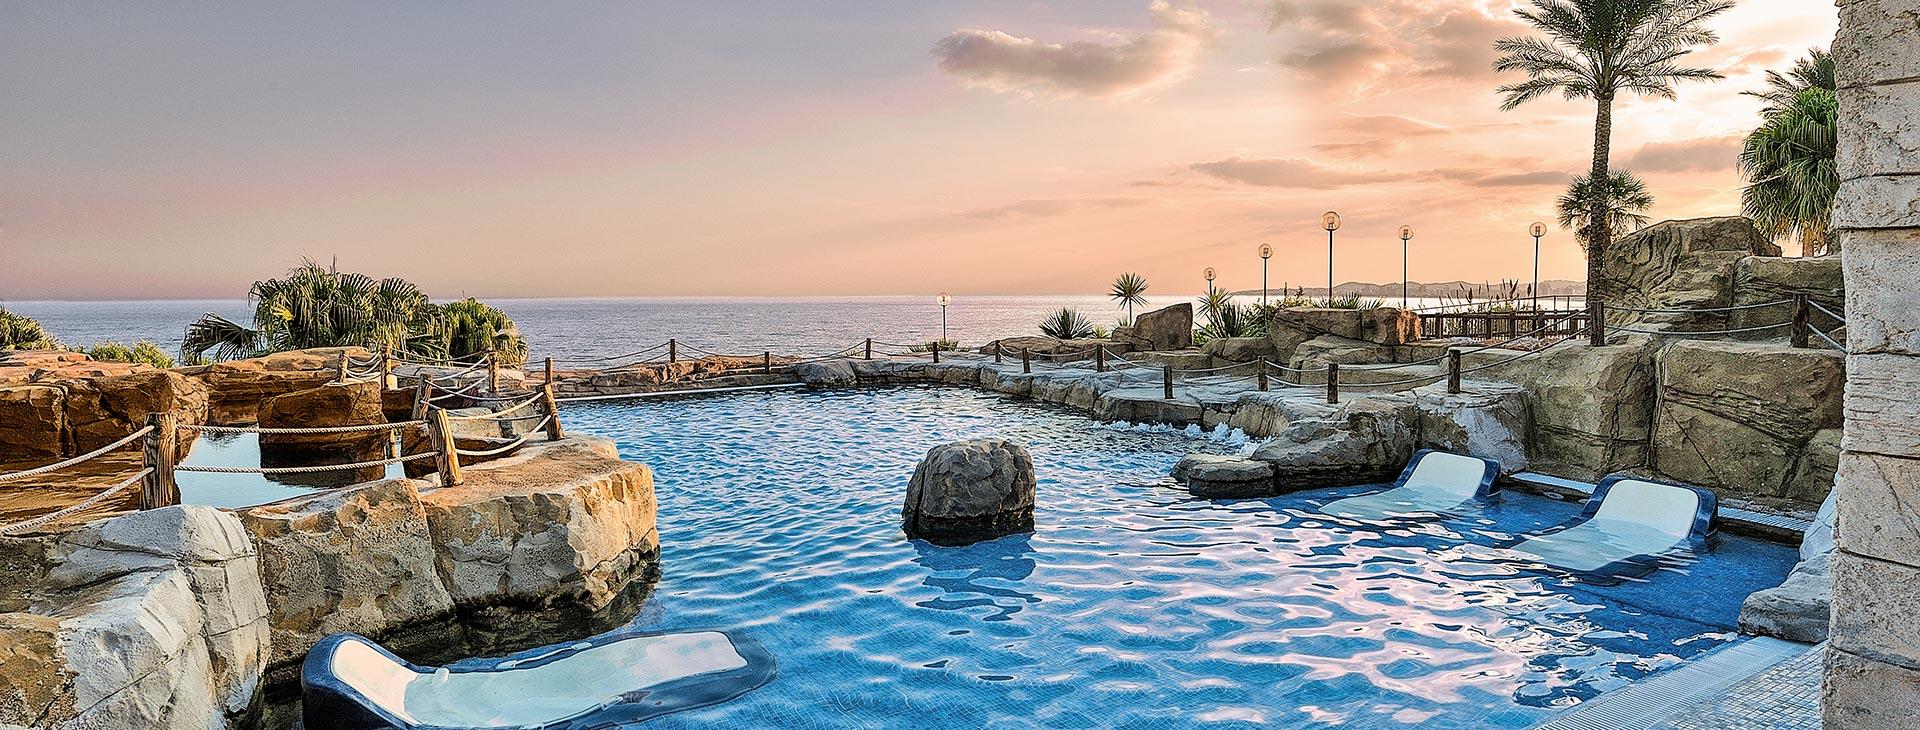 Holiday Village - Holiday World Hiszpania, Costa Del Sol, Benalmadena